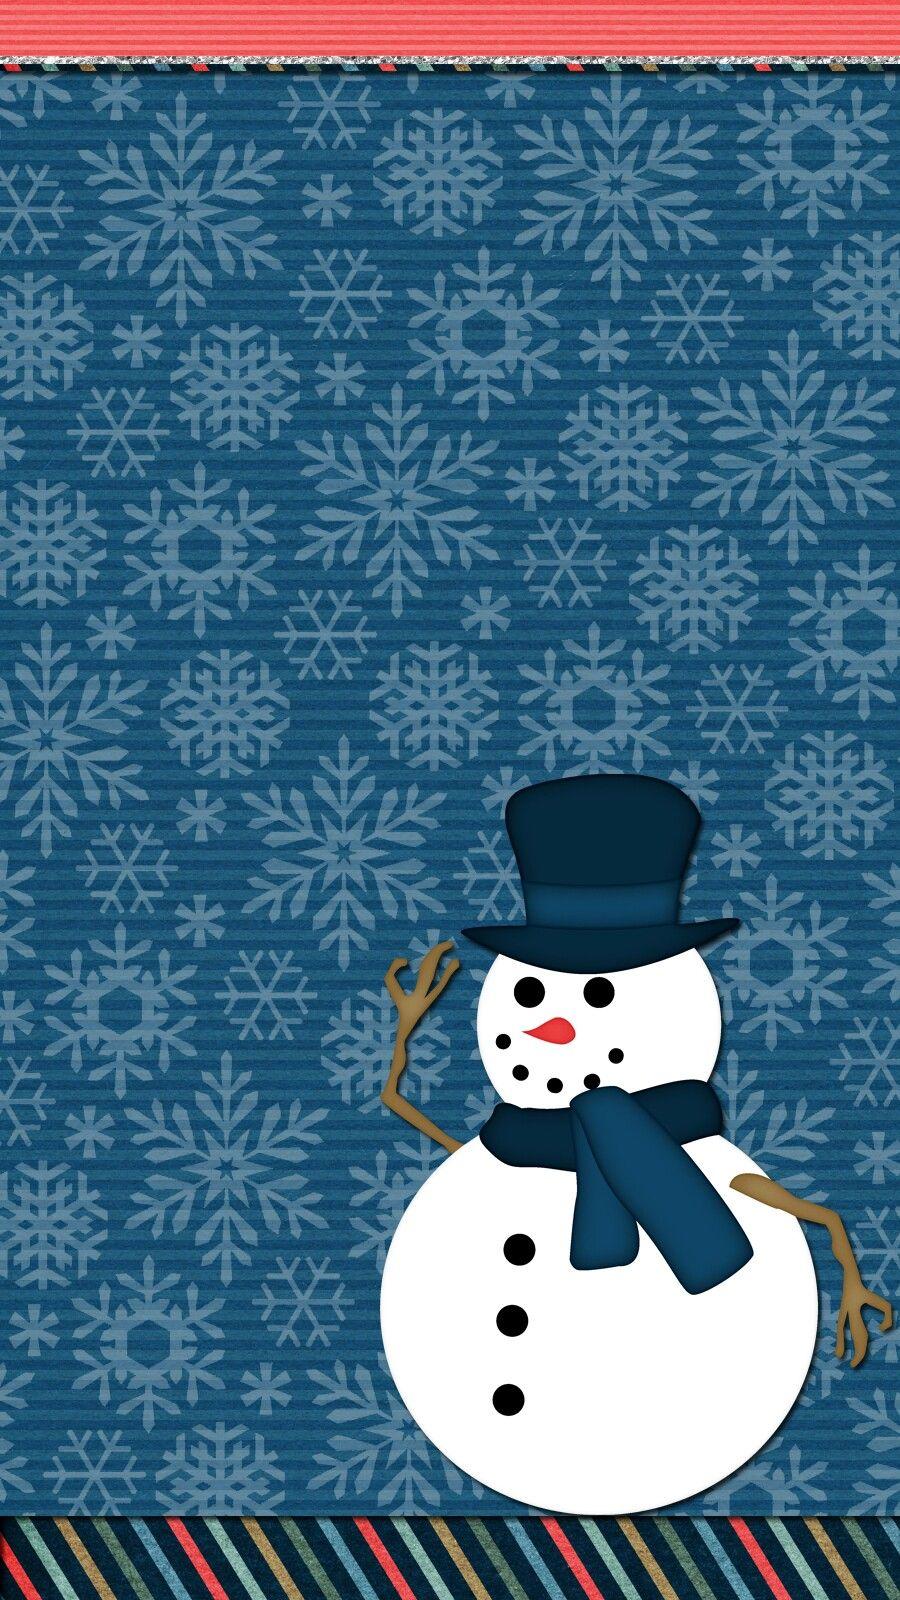 winter wallpaper iphone android cute SnowmenWallpaper 900x1600